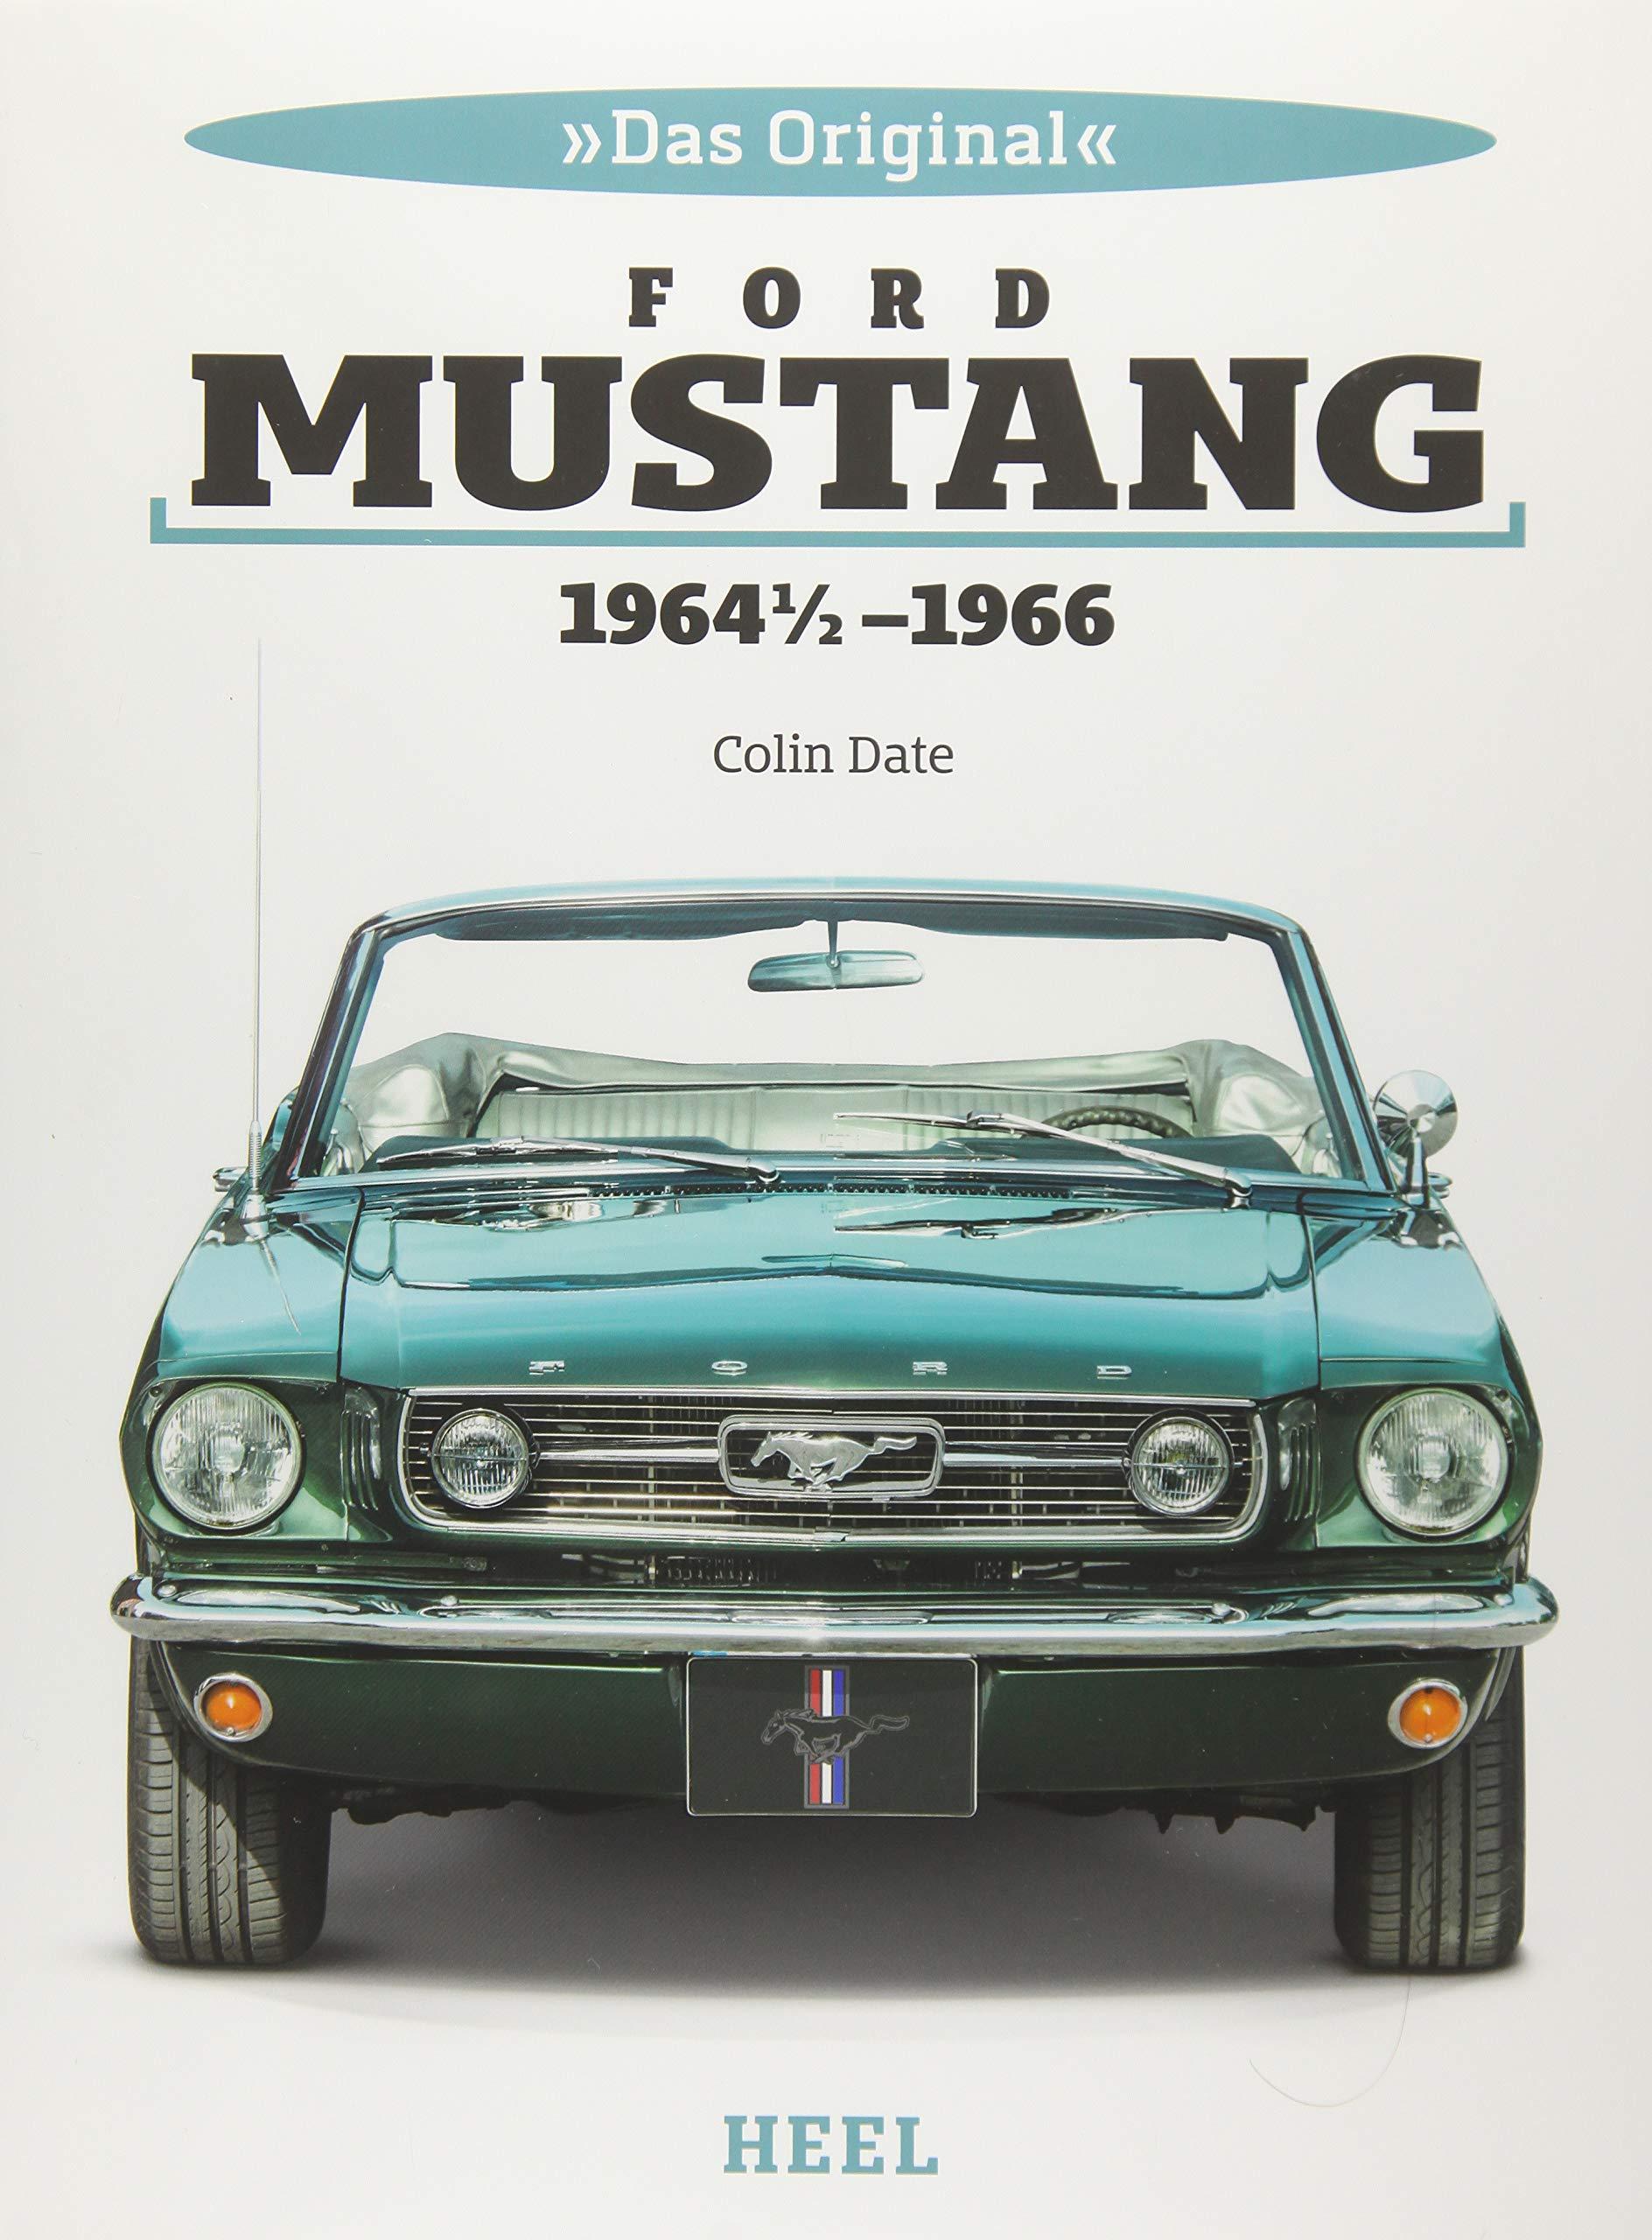 Das Original: Ford Mustang 1964 1/2 bis 1966: Amazon.es ...